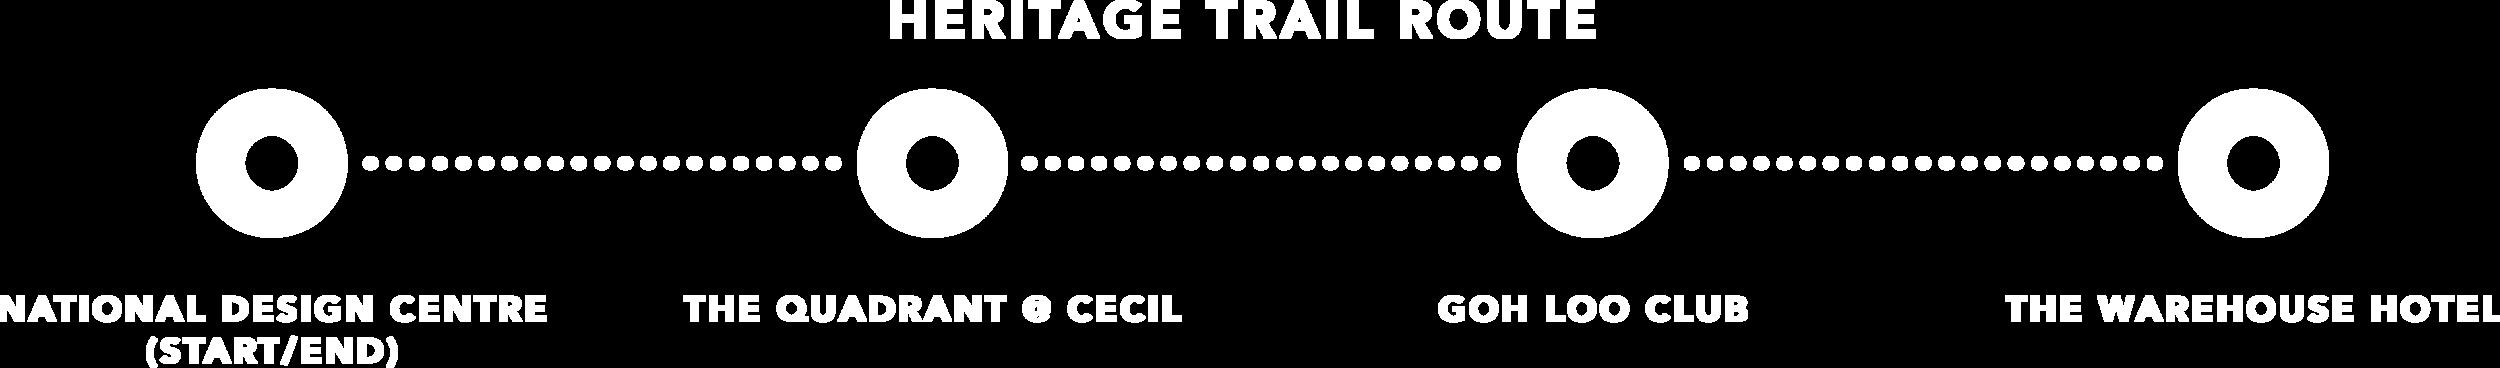 HERITAGE TRAIL V3 TOUR MODE.png